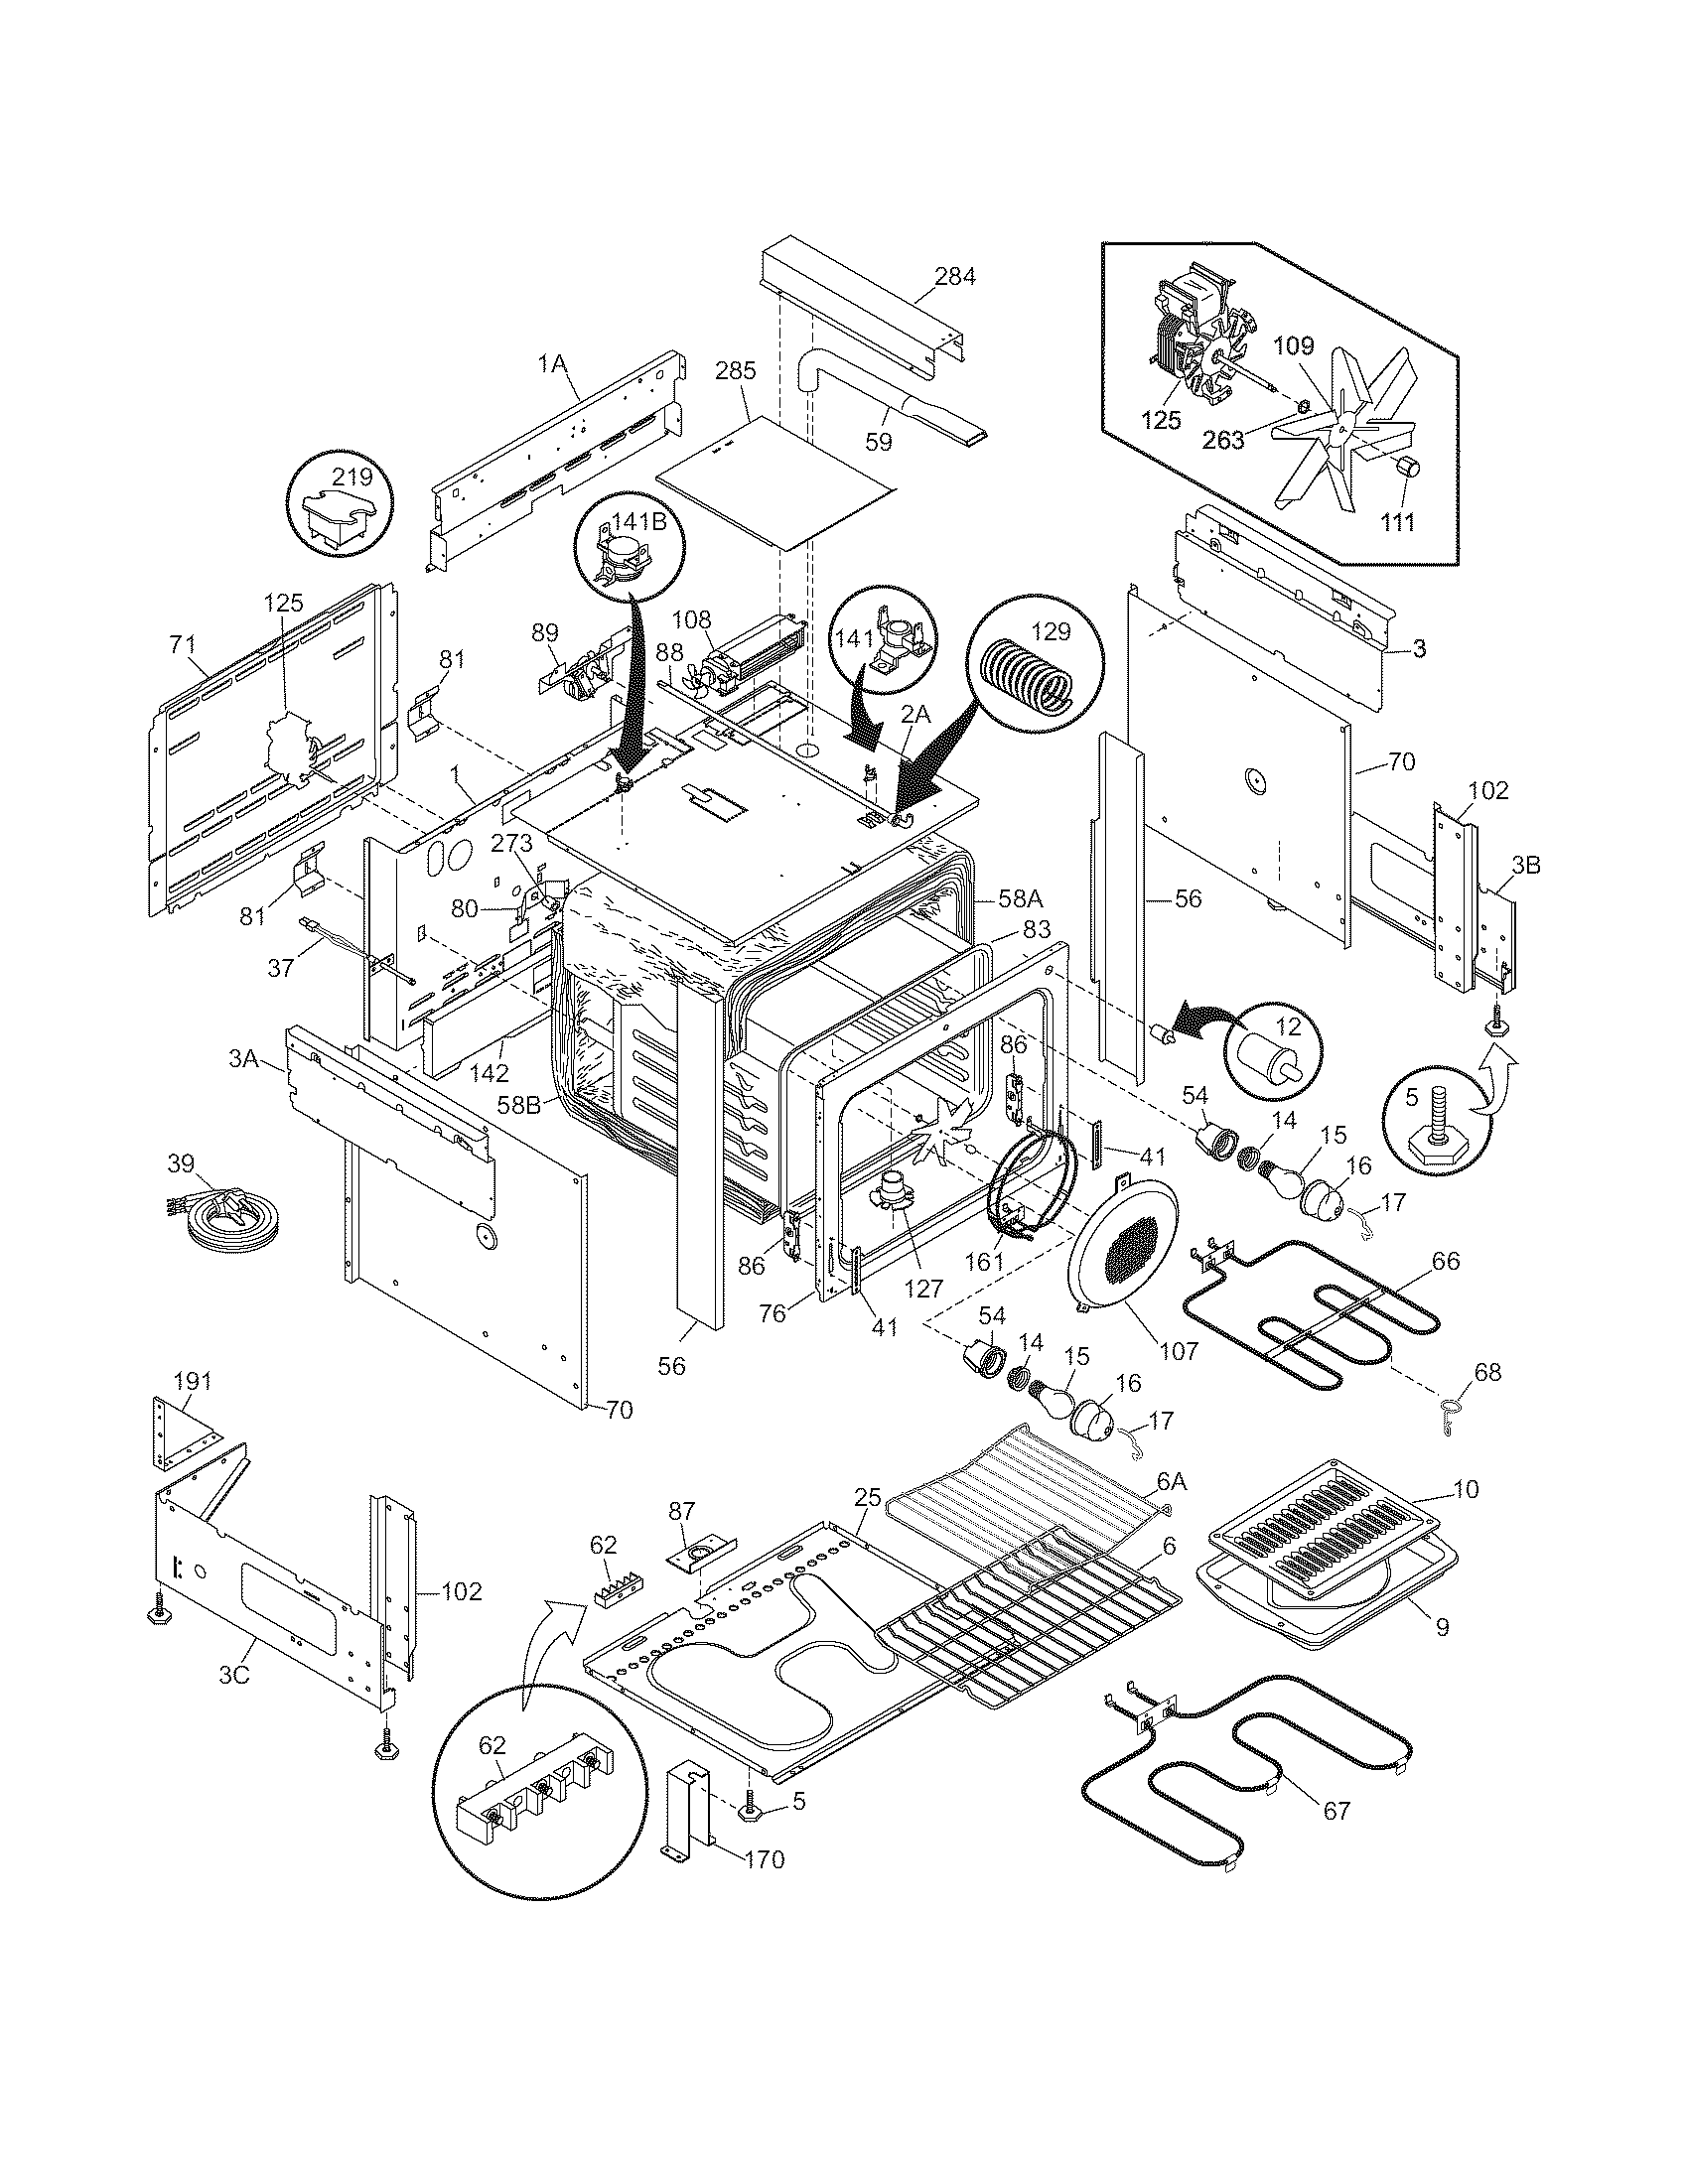 Perfect frigidaire range parts diagrams frigidaire range parts diagrams 1700 x 2200 · 80 kb ·